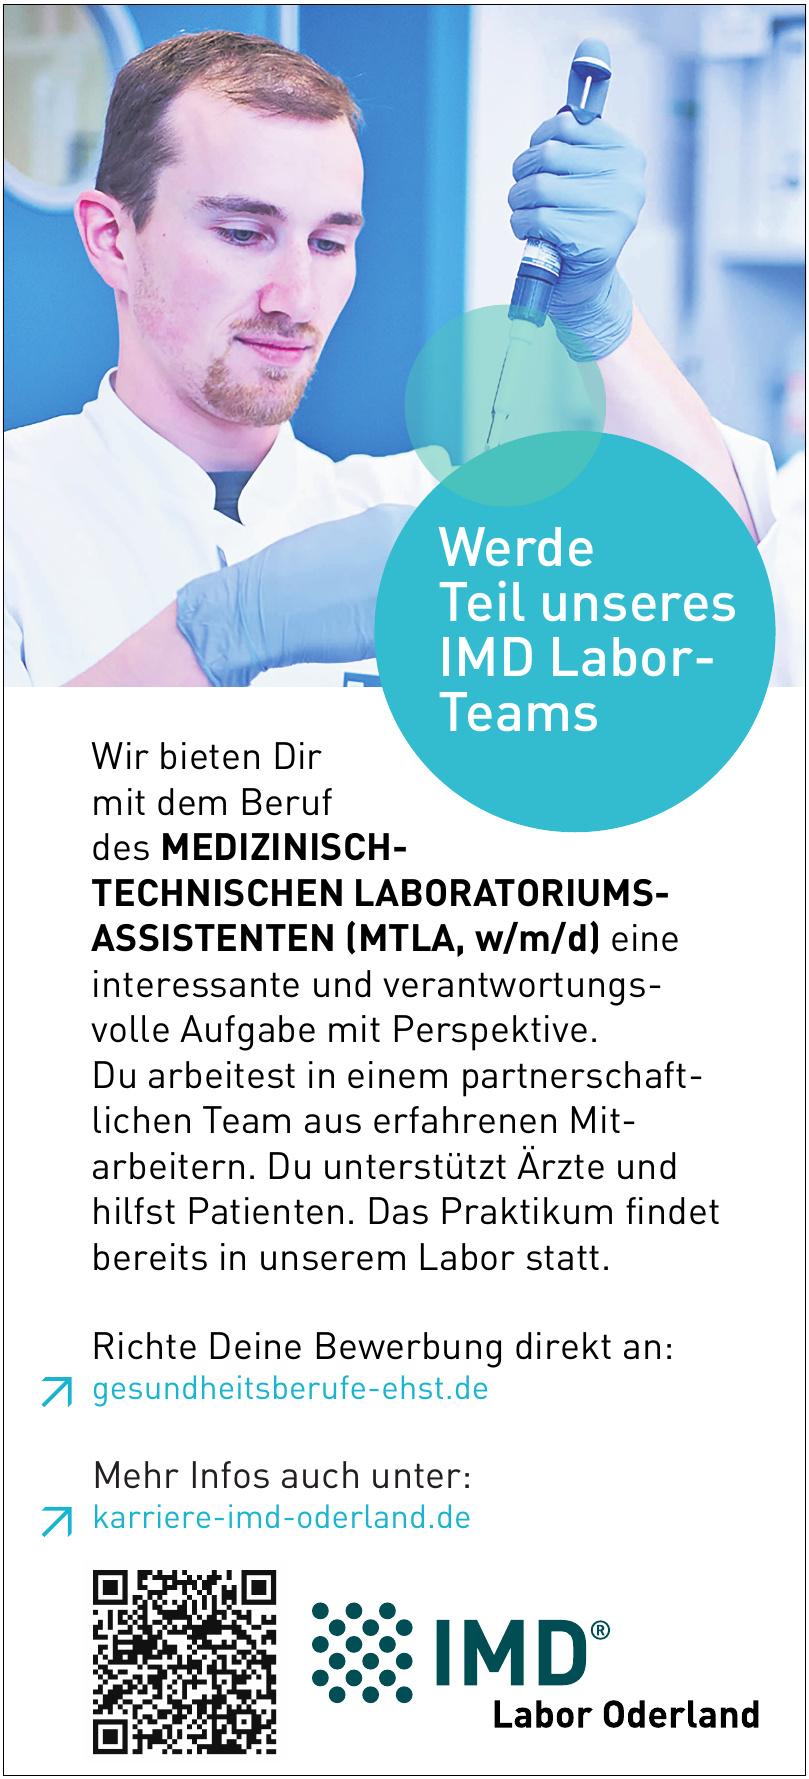 IMD Labor Oderland